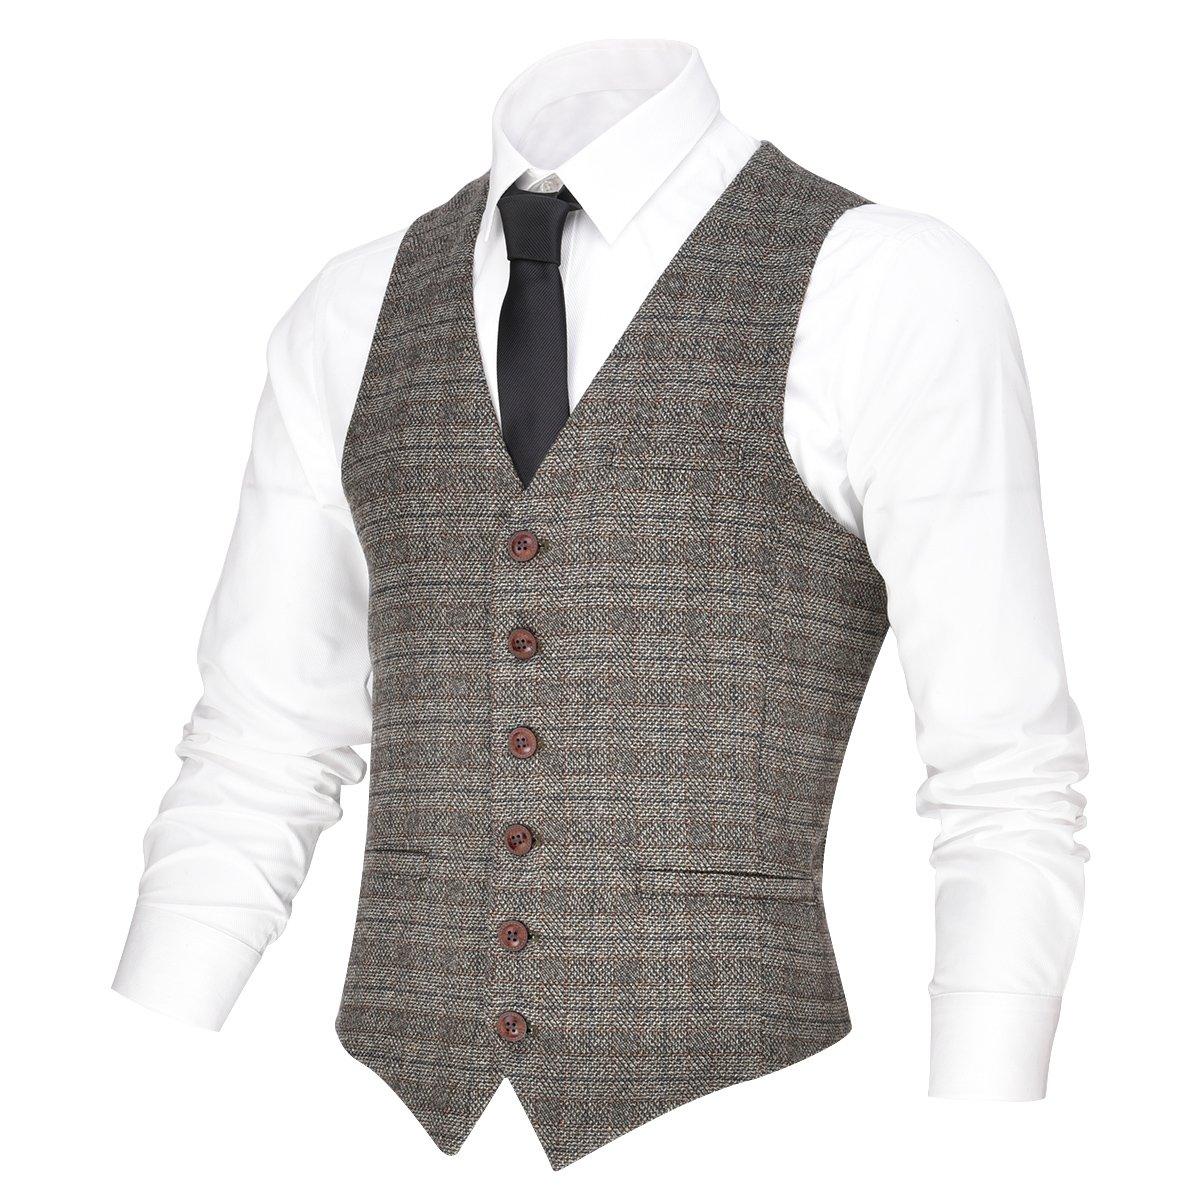 VOBOOM Men's V-Neck Suit Vest Casual Slim Fit Dress 6 Button Vest Waistcoat (Brown, L) by VOBOOM